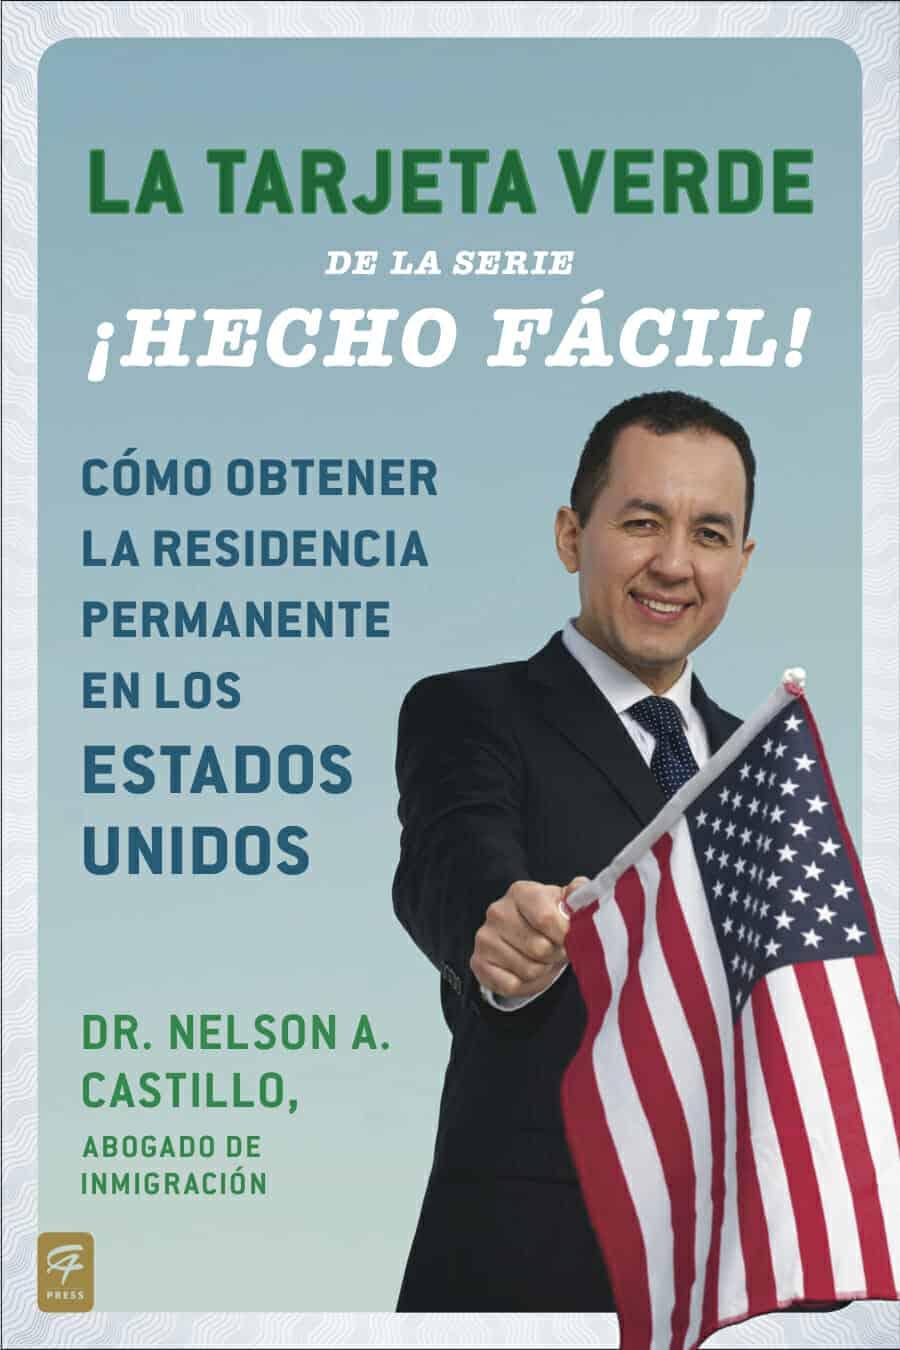 La Tarjeta Verde Book Cover